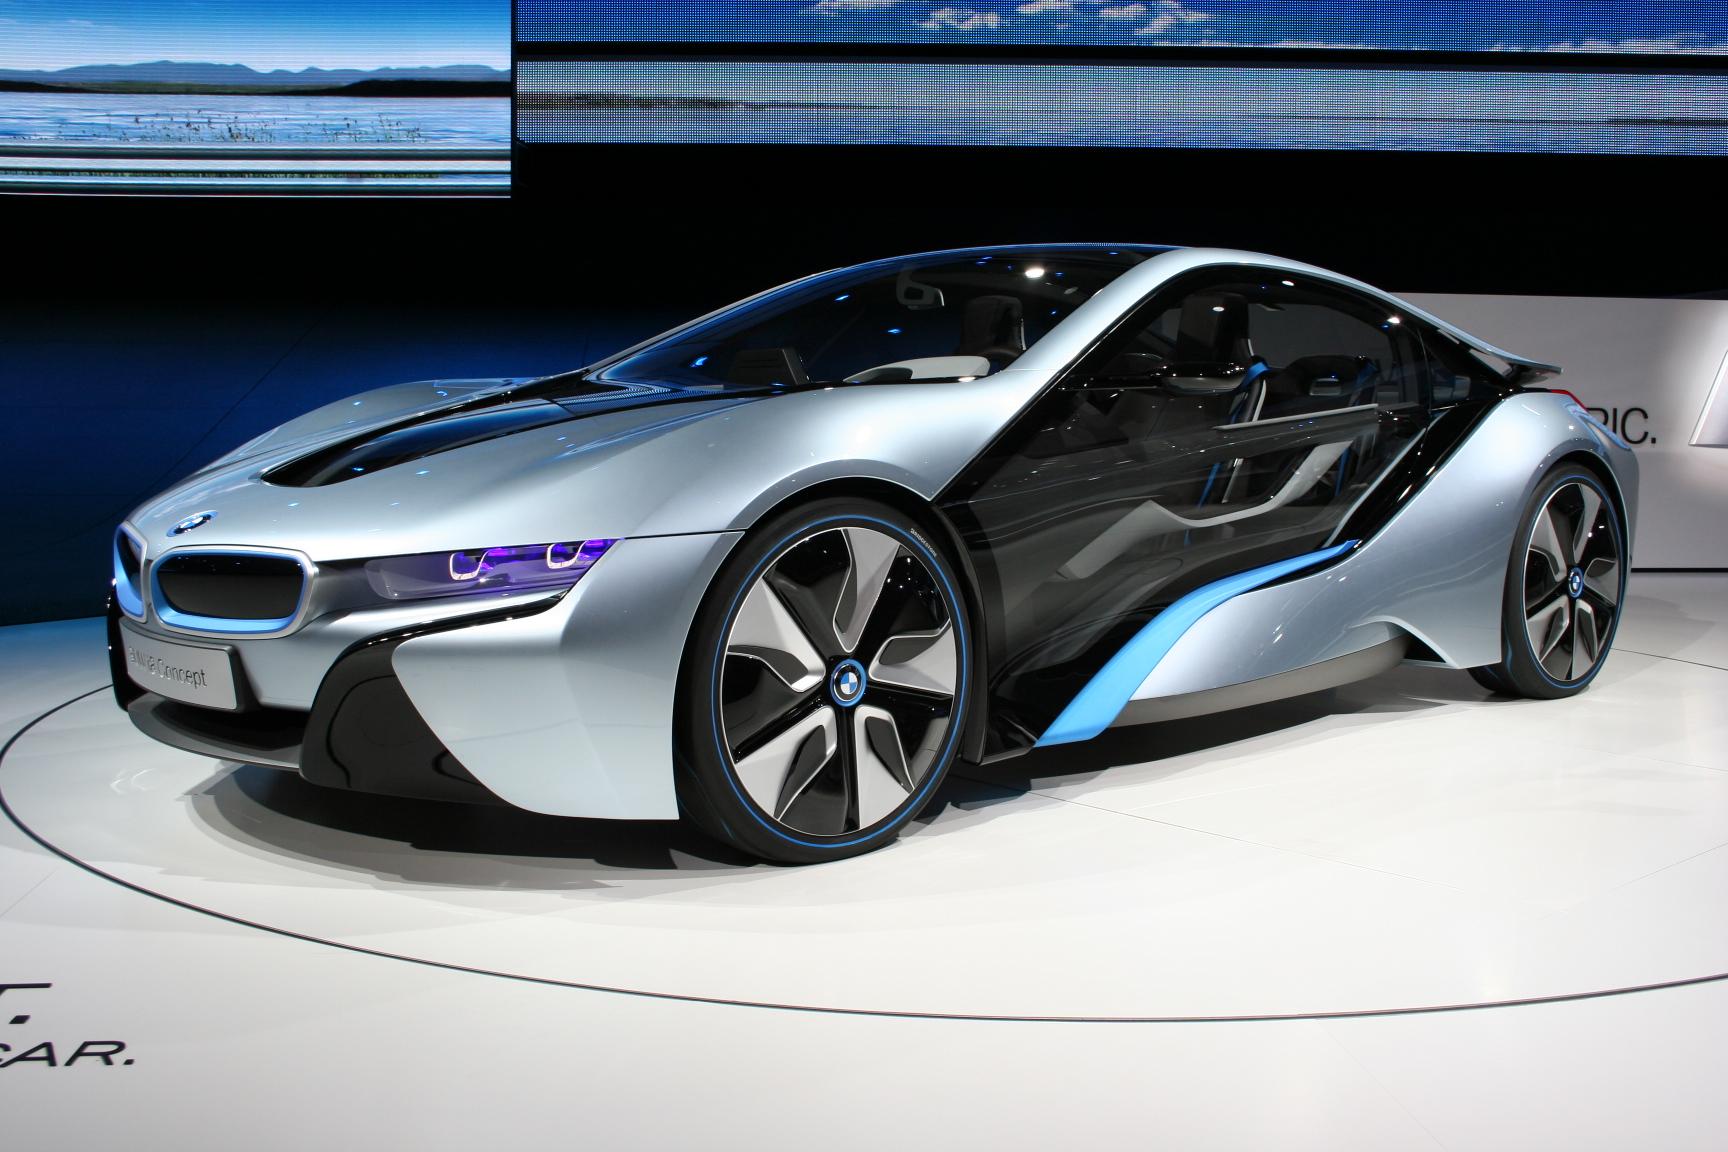 State Of Art Concept Cars Glisten At Auto Expo Fullfuntoo